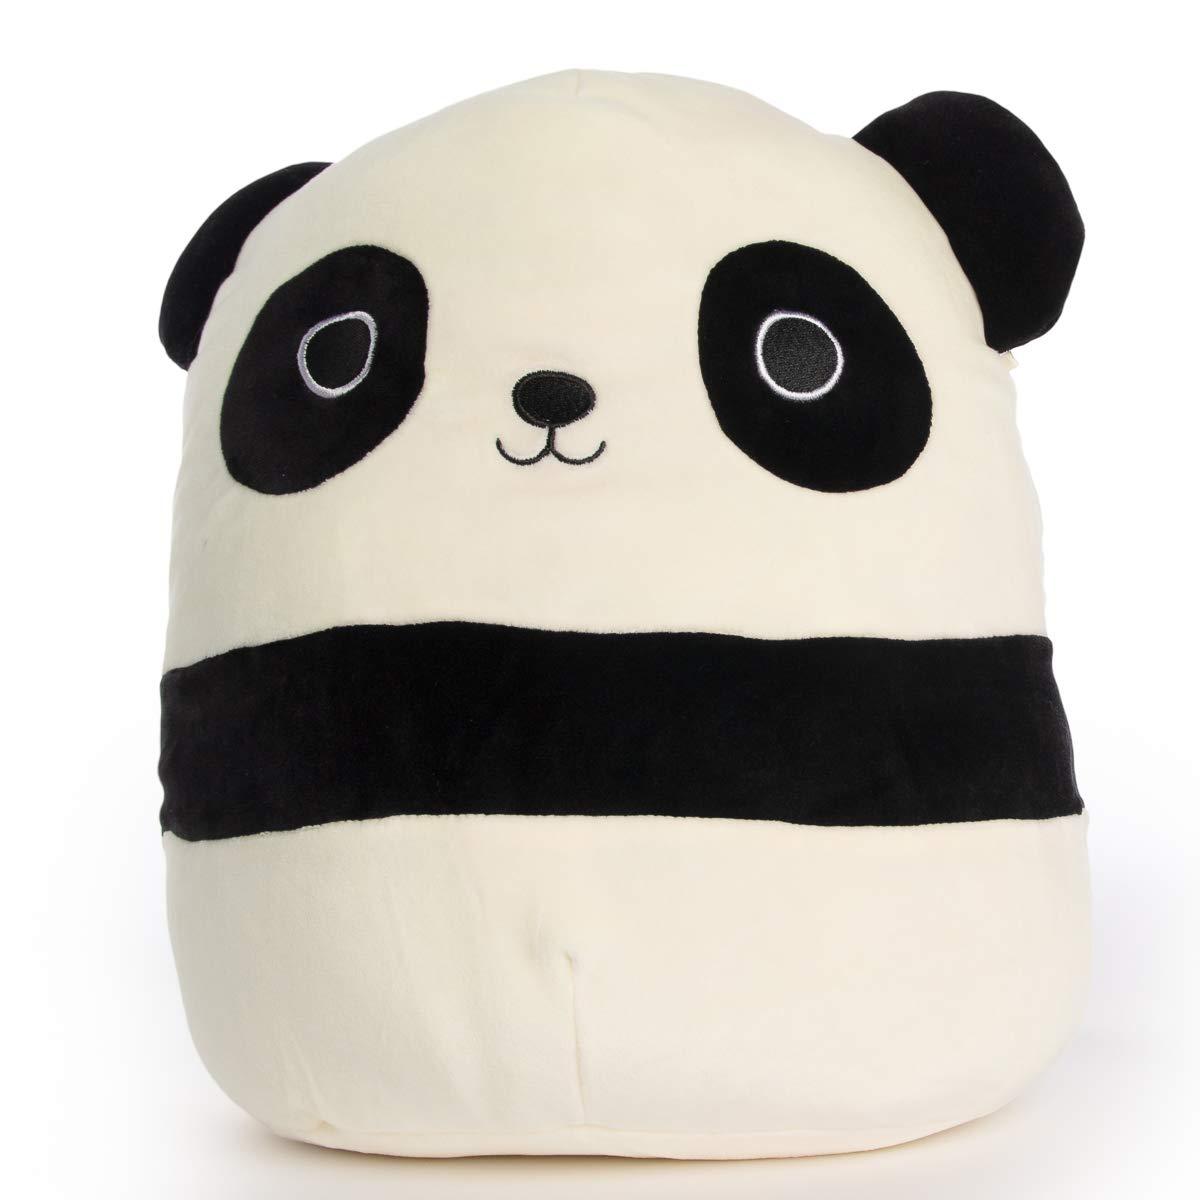 Squishmallow 12'' Plush Soft Animal Pillow Toy (Stanley The Black Panda)